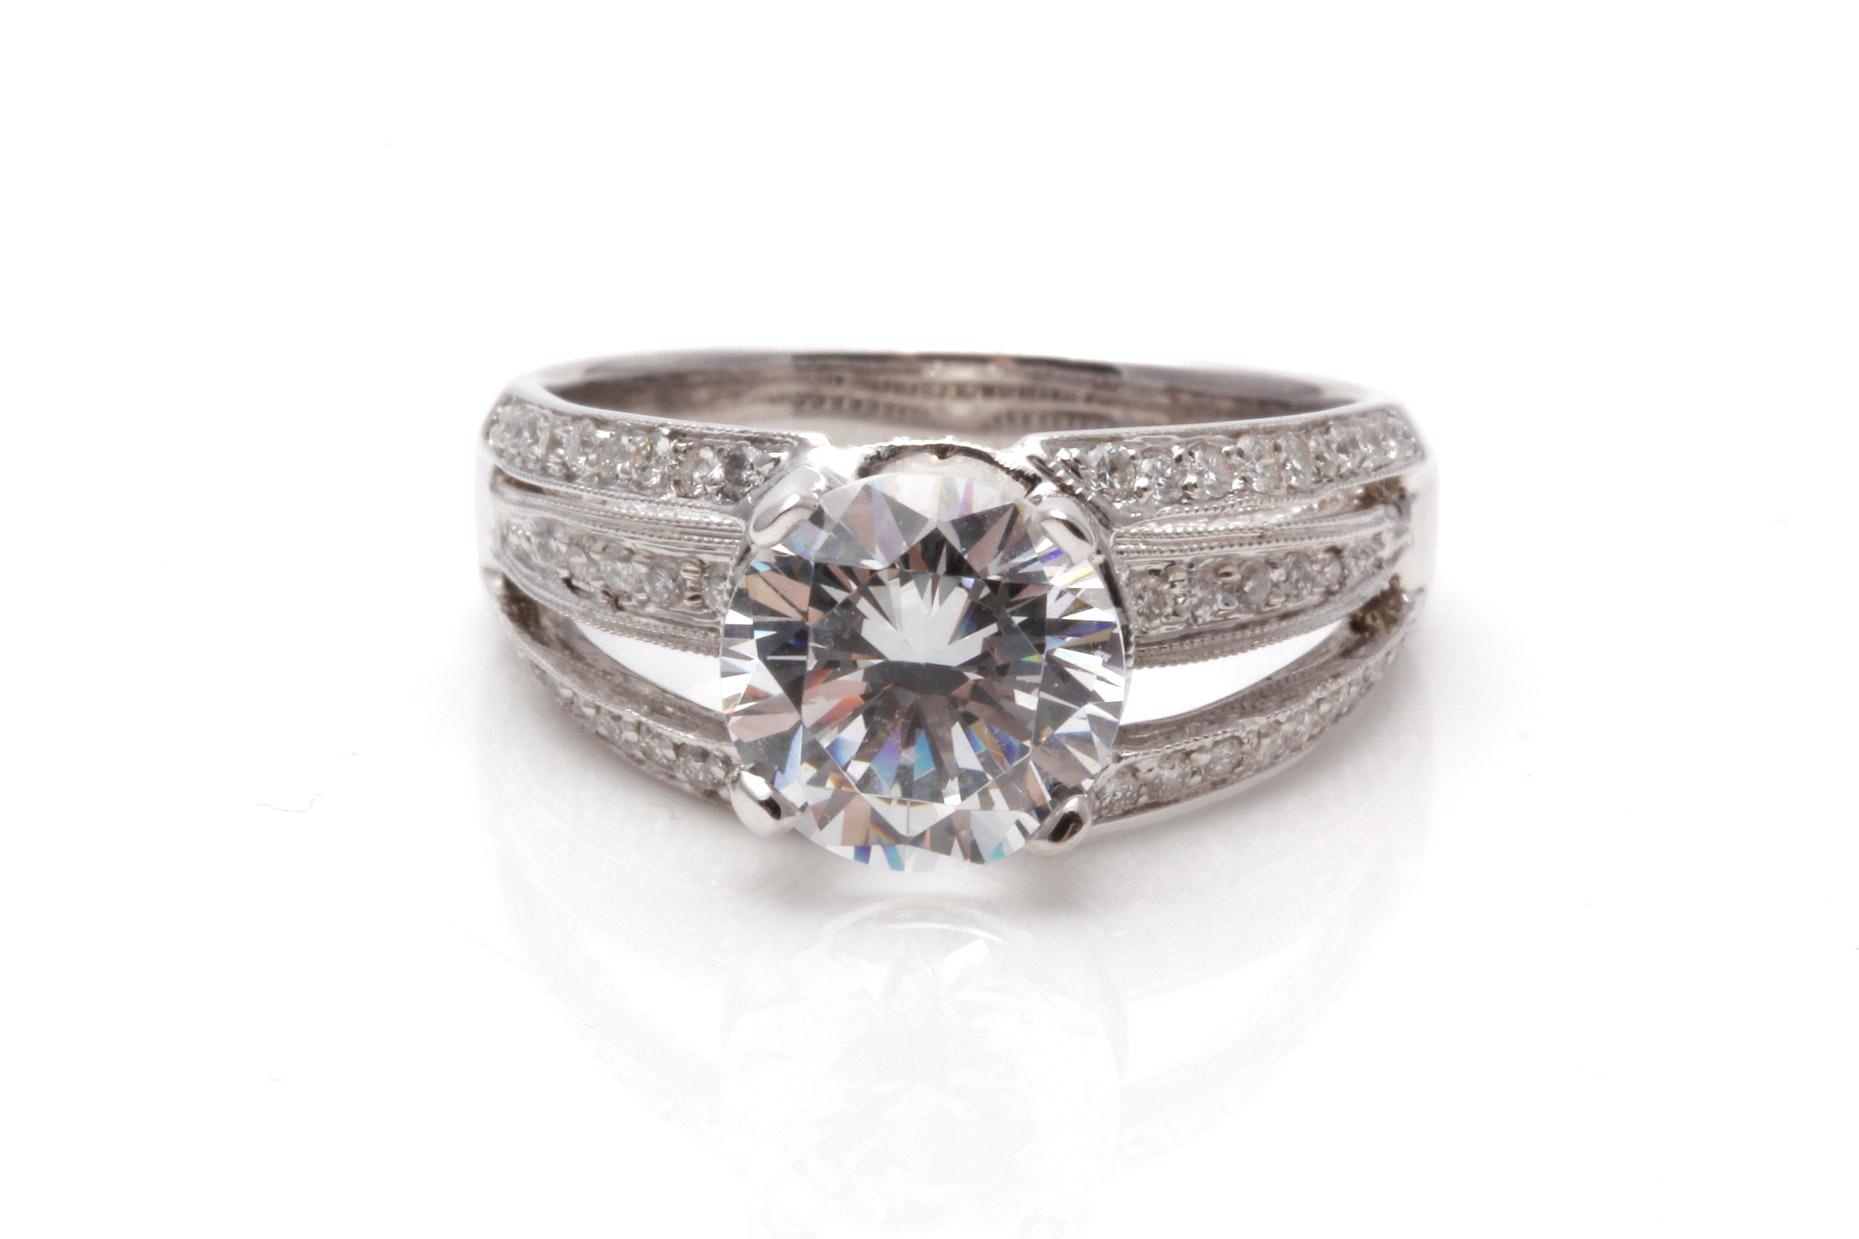 14K White Gold 1.25 CTW Semi Mount Diamond Ring With Cubic Zirconia Center Stone